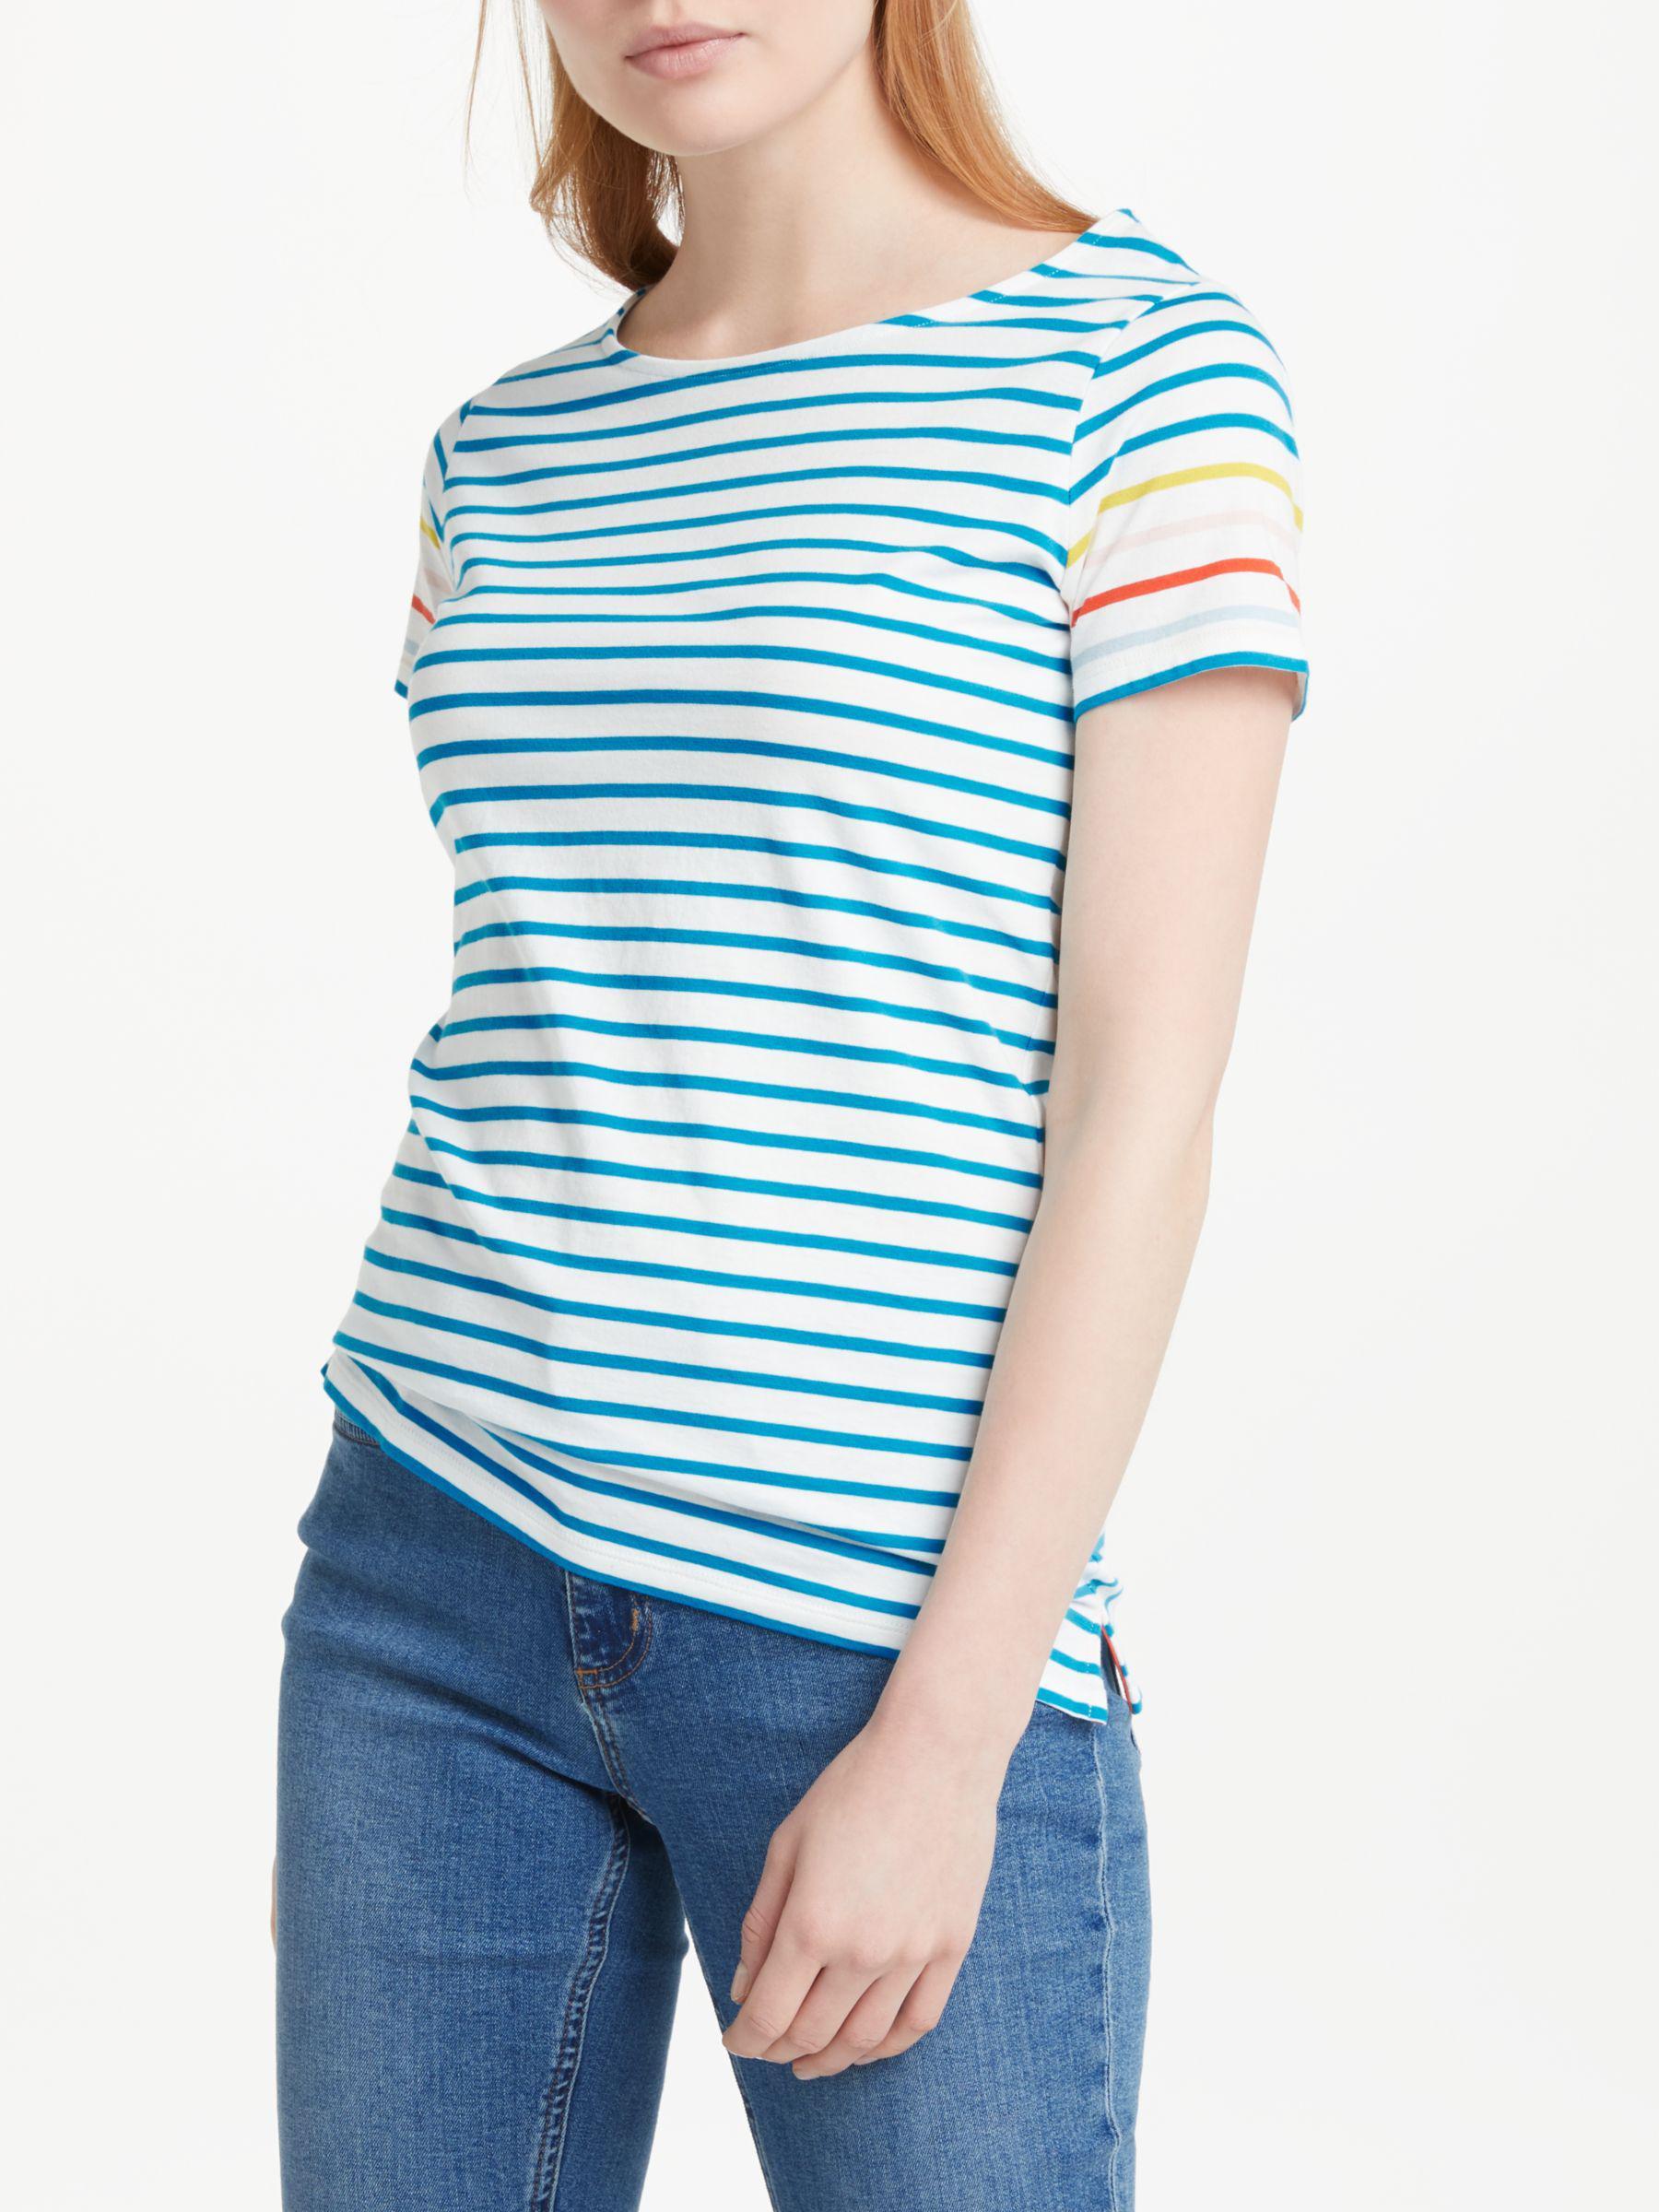 Boden Breton Short Sleeve T-Shirt Buy Cheap 100% Guaranteed Very Cheap Sale Online Xky8tpumx